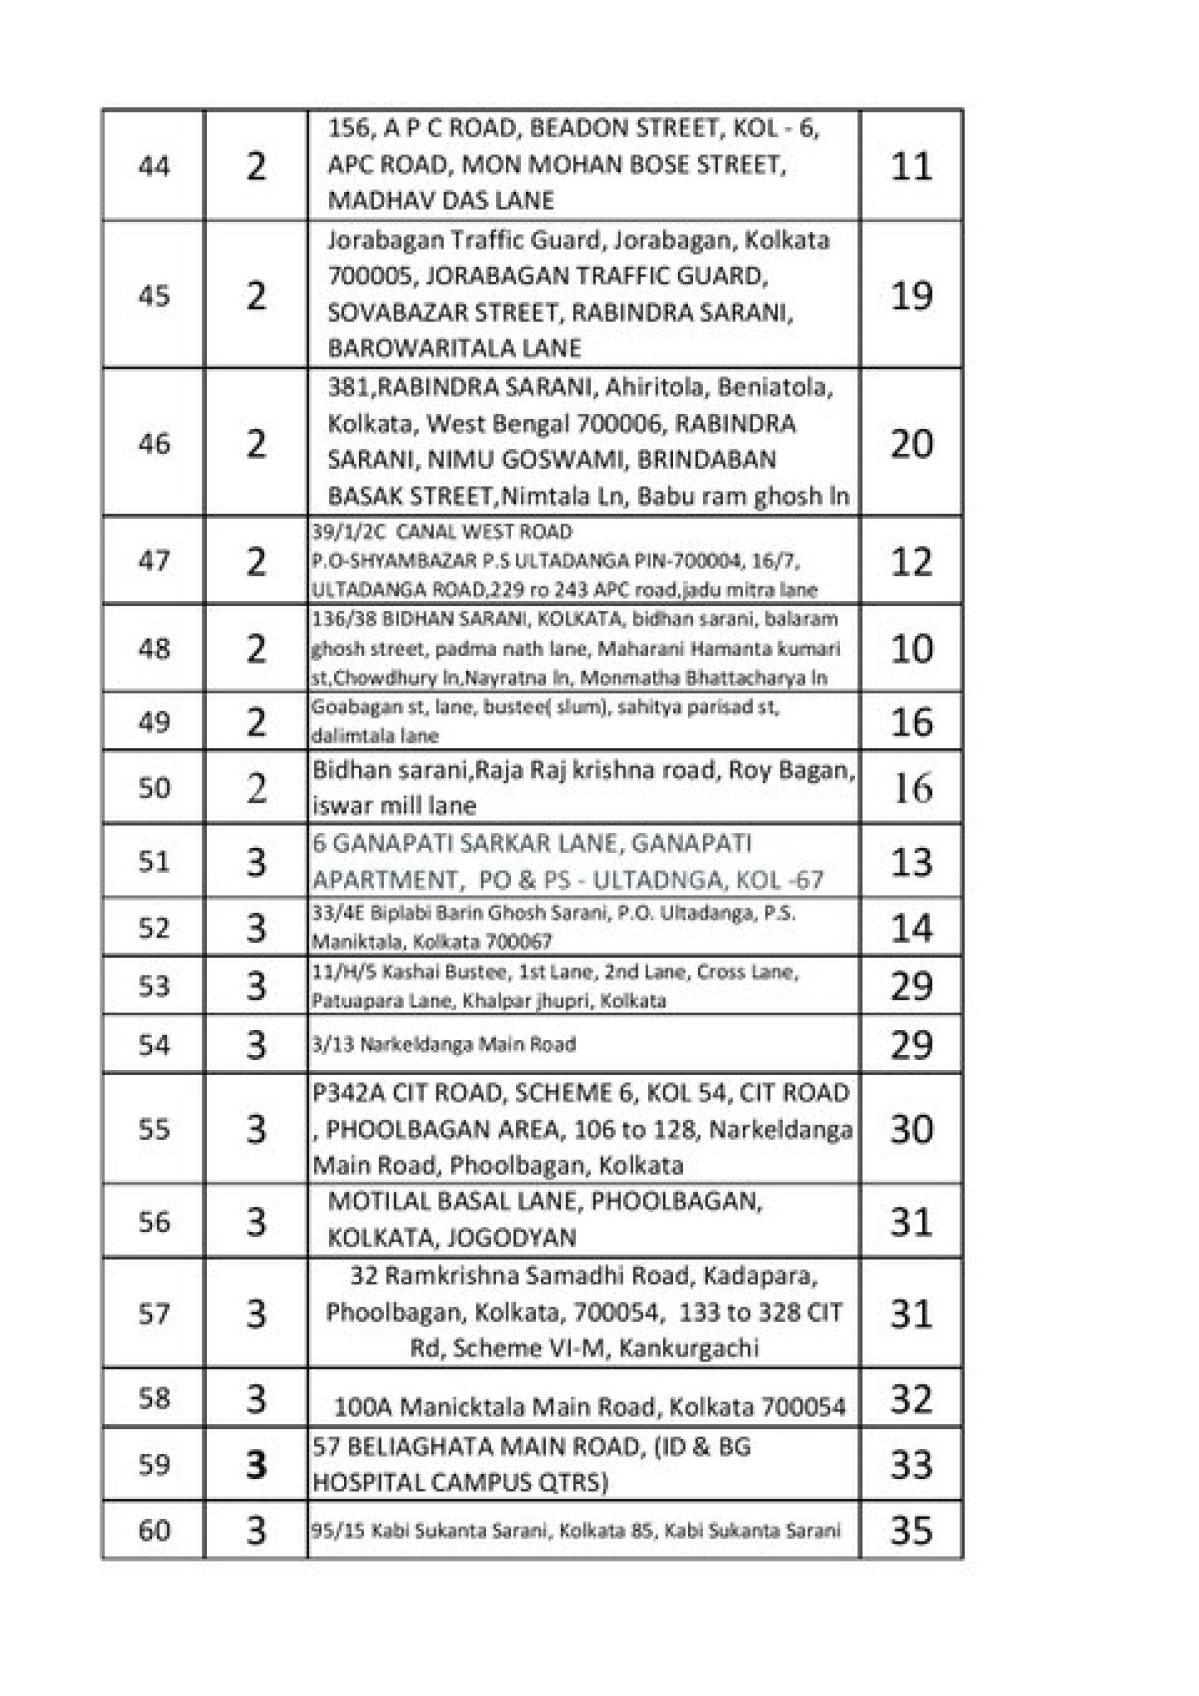 Coronavirus in West Bengal: Full list of containment zones in Kolkata